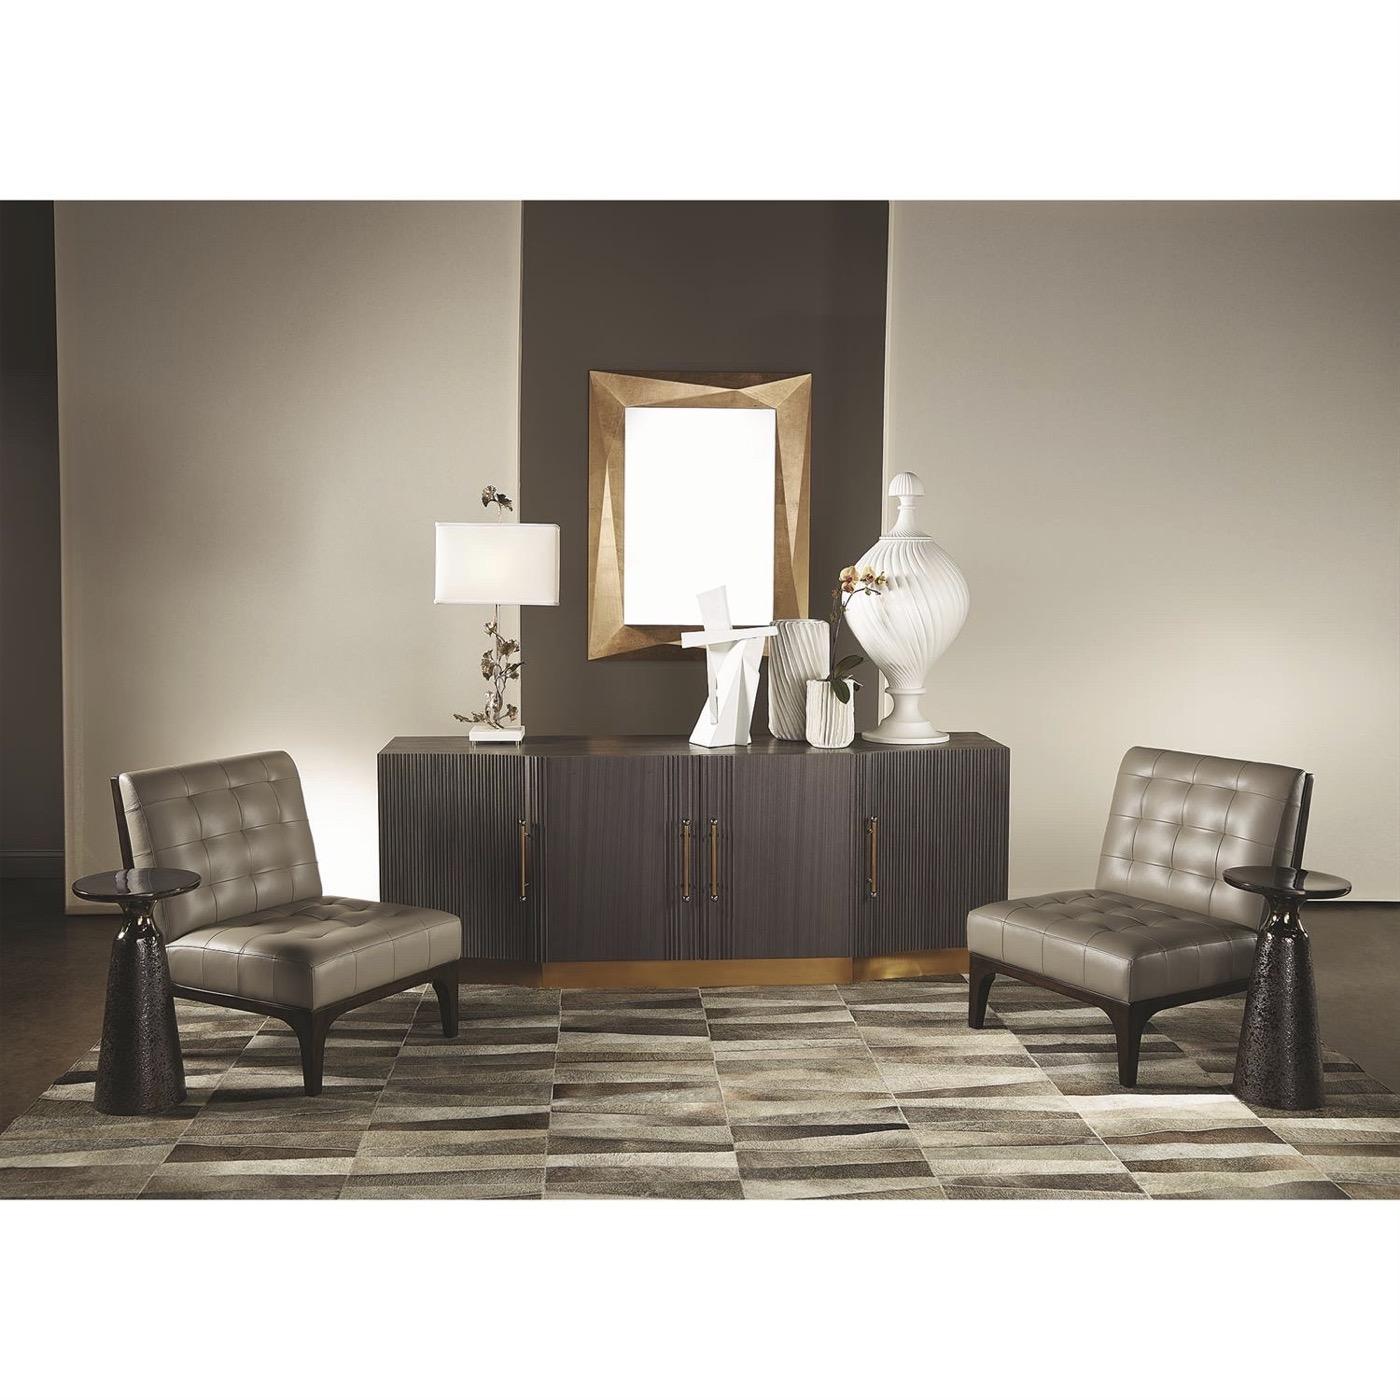 Quarry Bronze Side Table | Pedestal